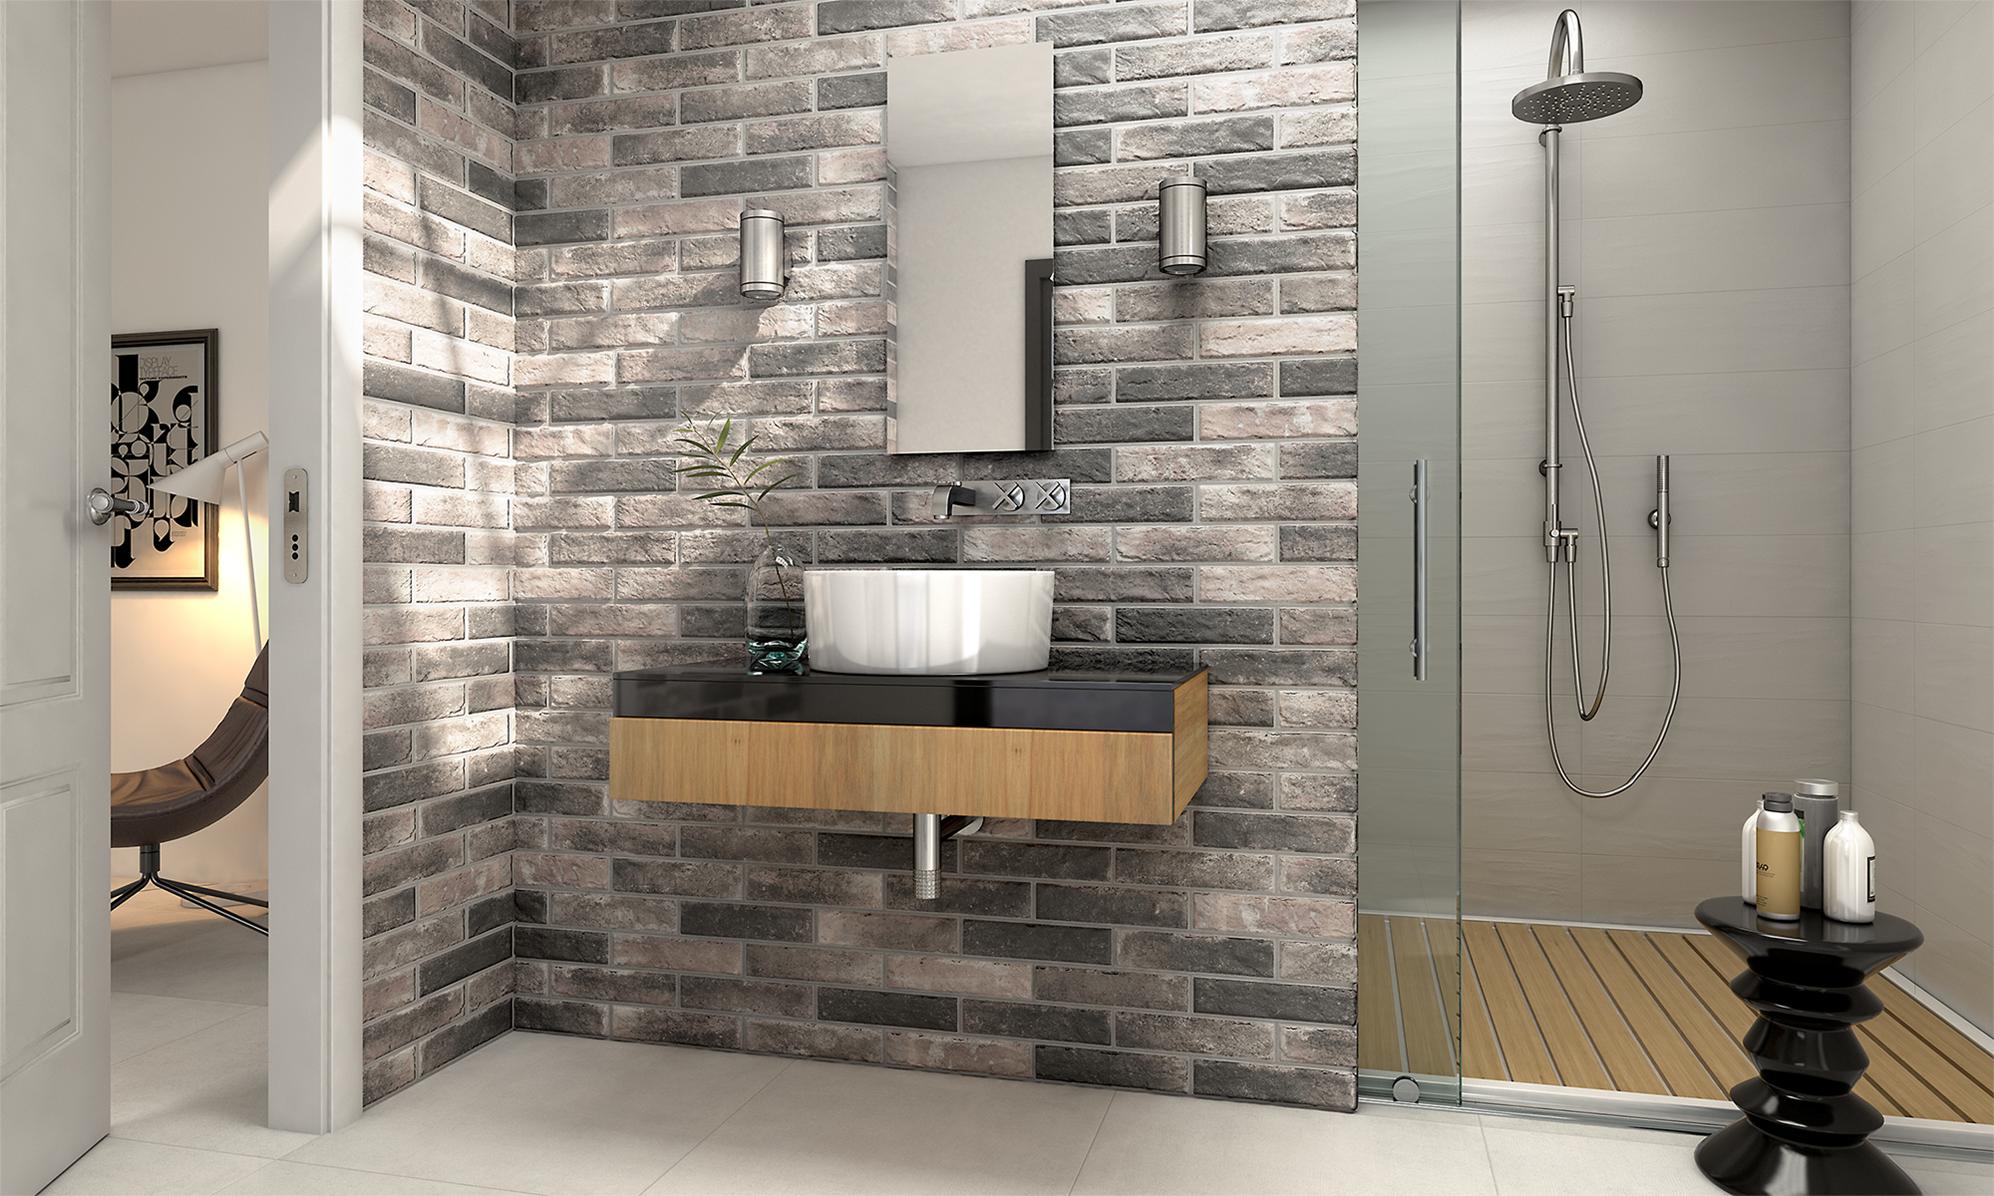 Brickwall - Bristol Tile Company